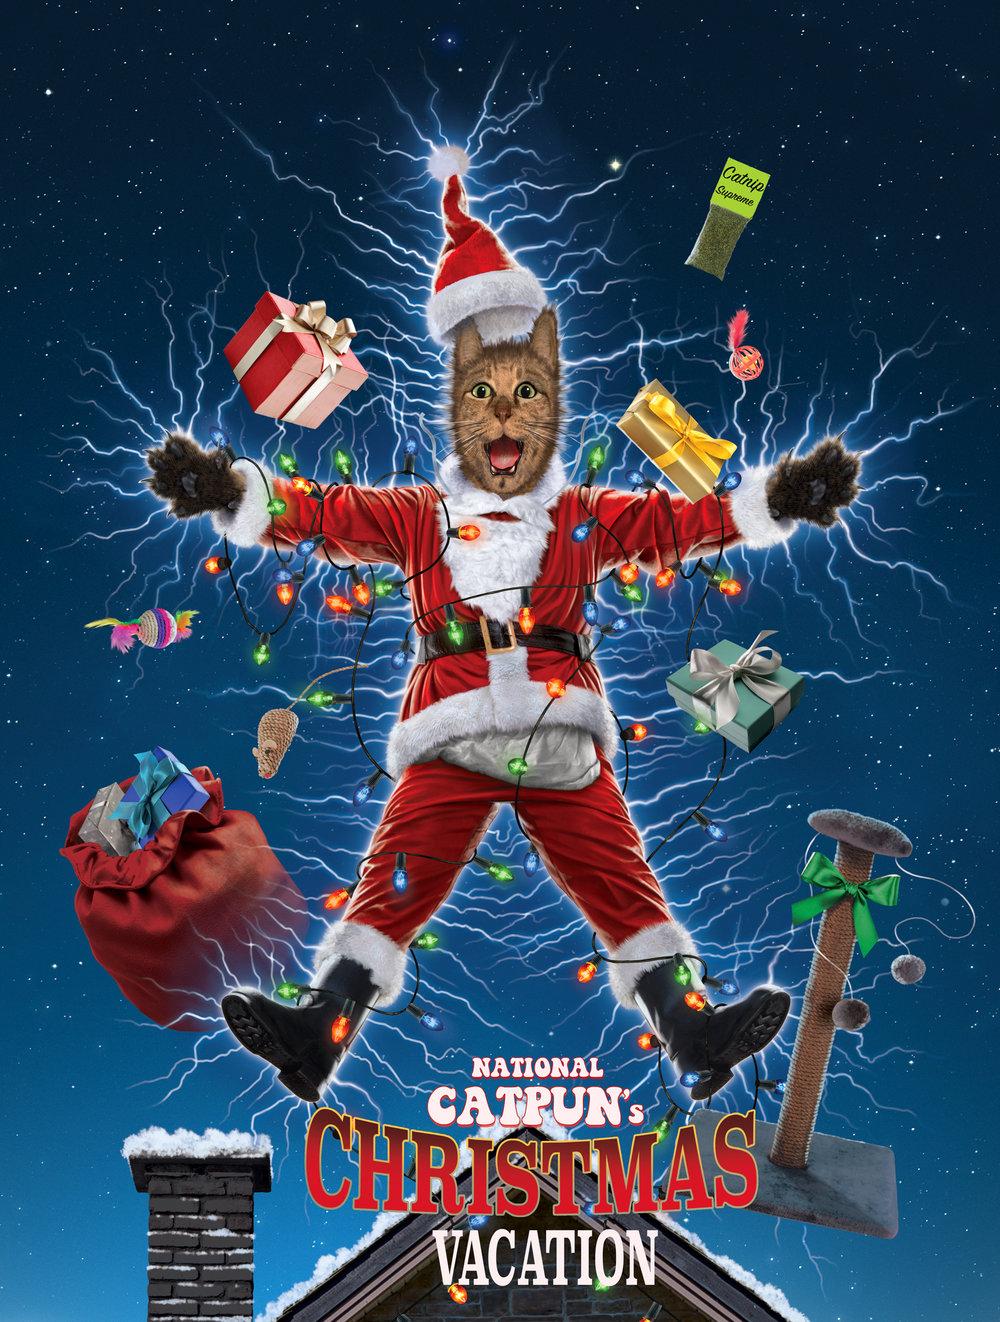 National+catpun's+Christmas+Vacation+version+2.jpg